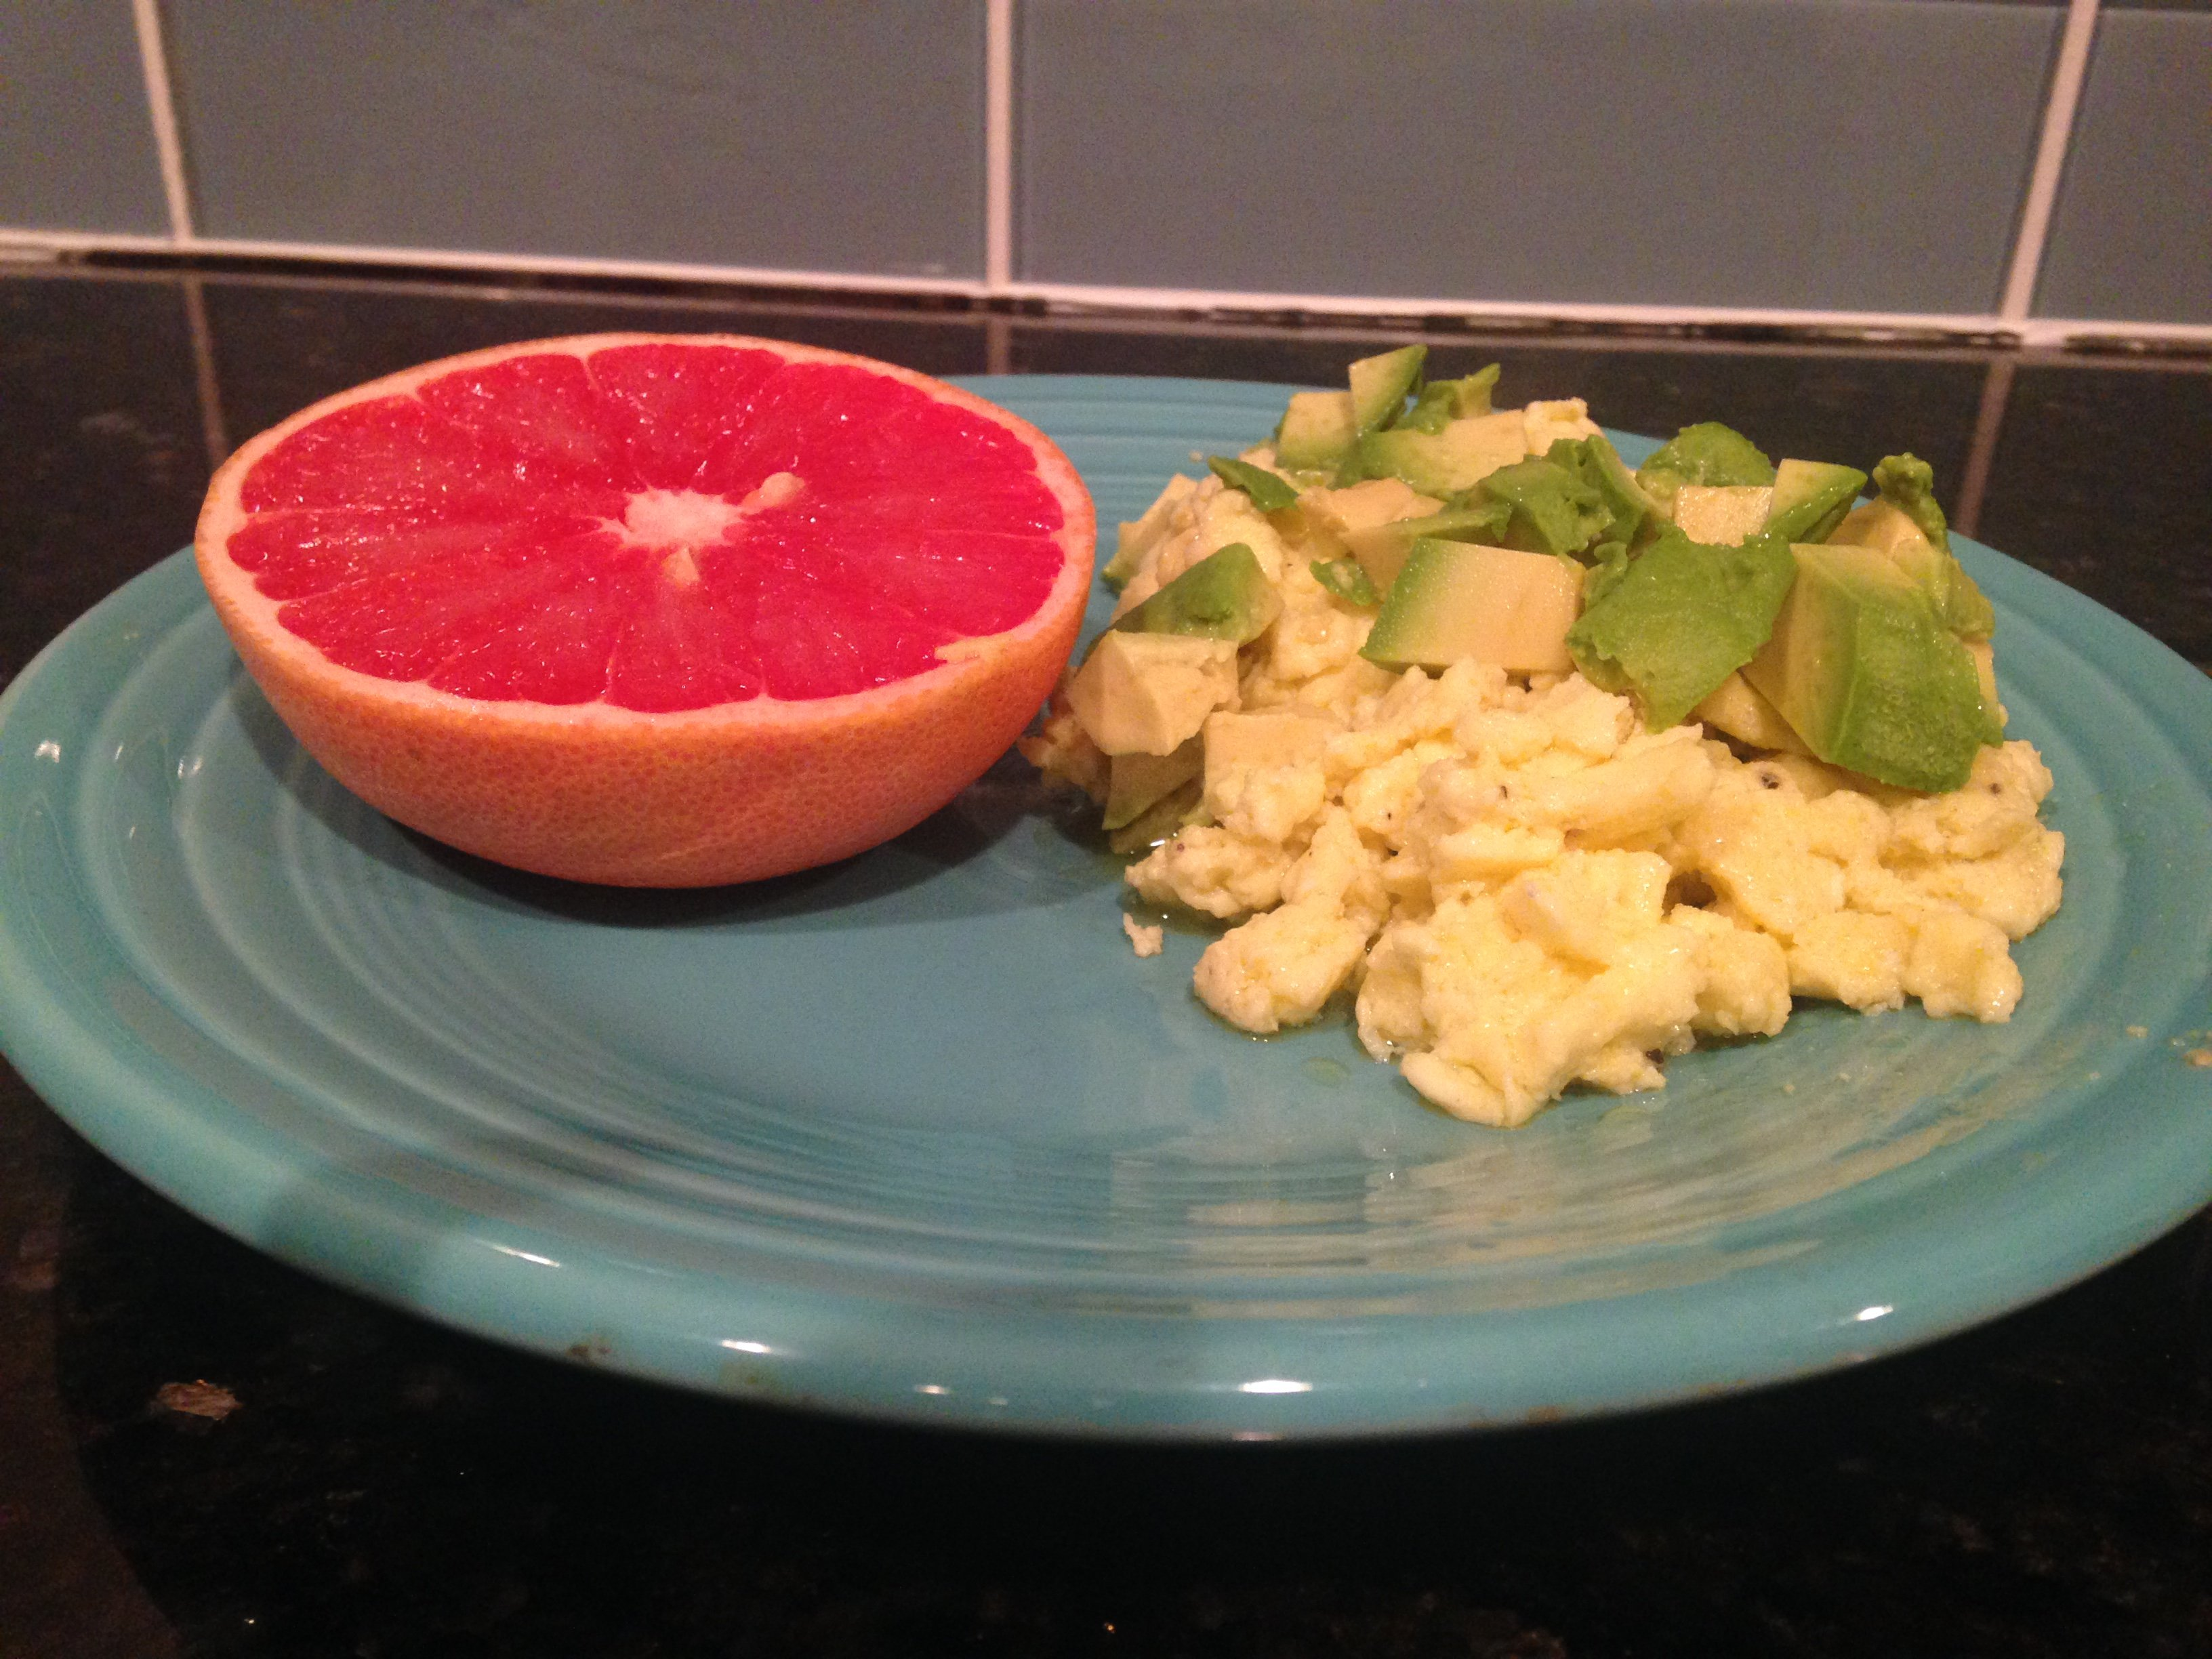 Ricotta Scrambled eggs with avocado, grapefruit